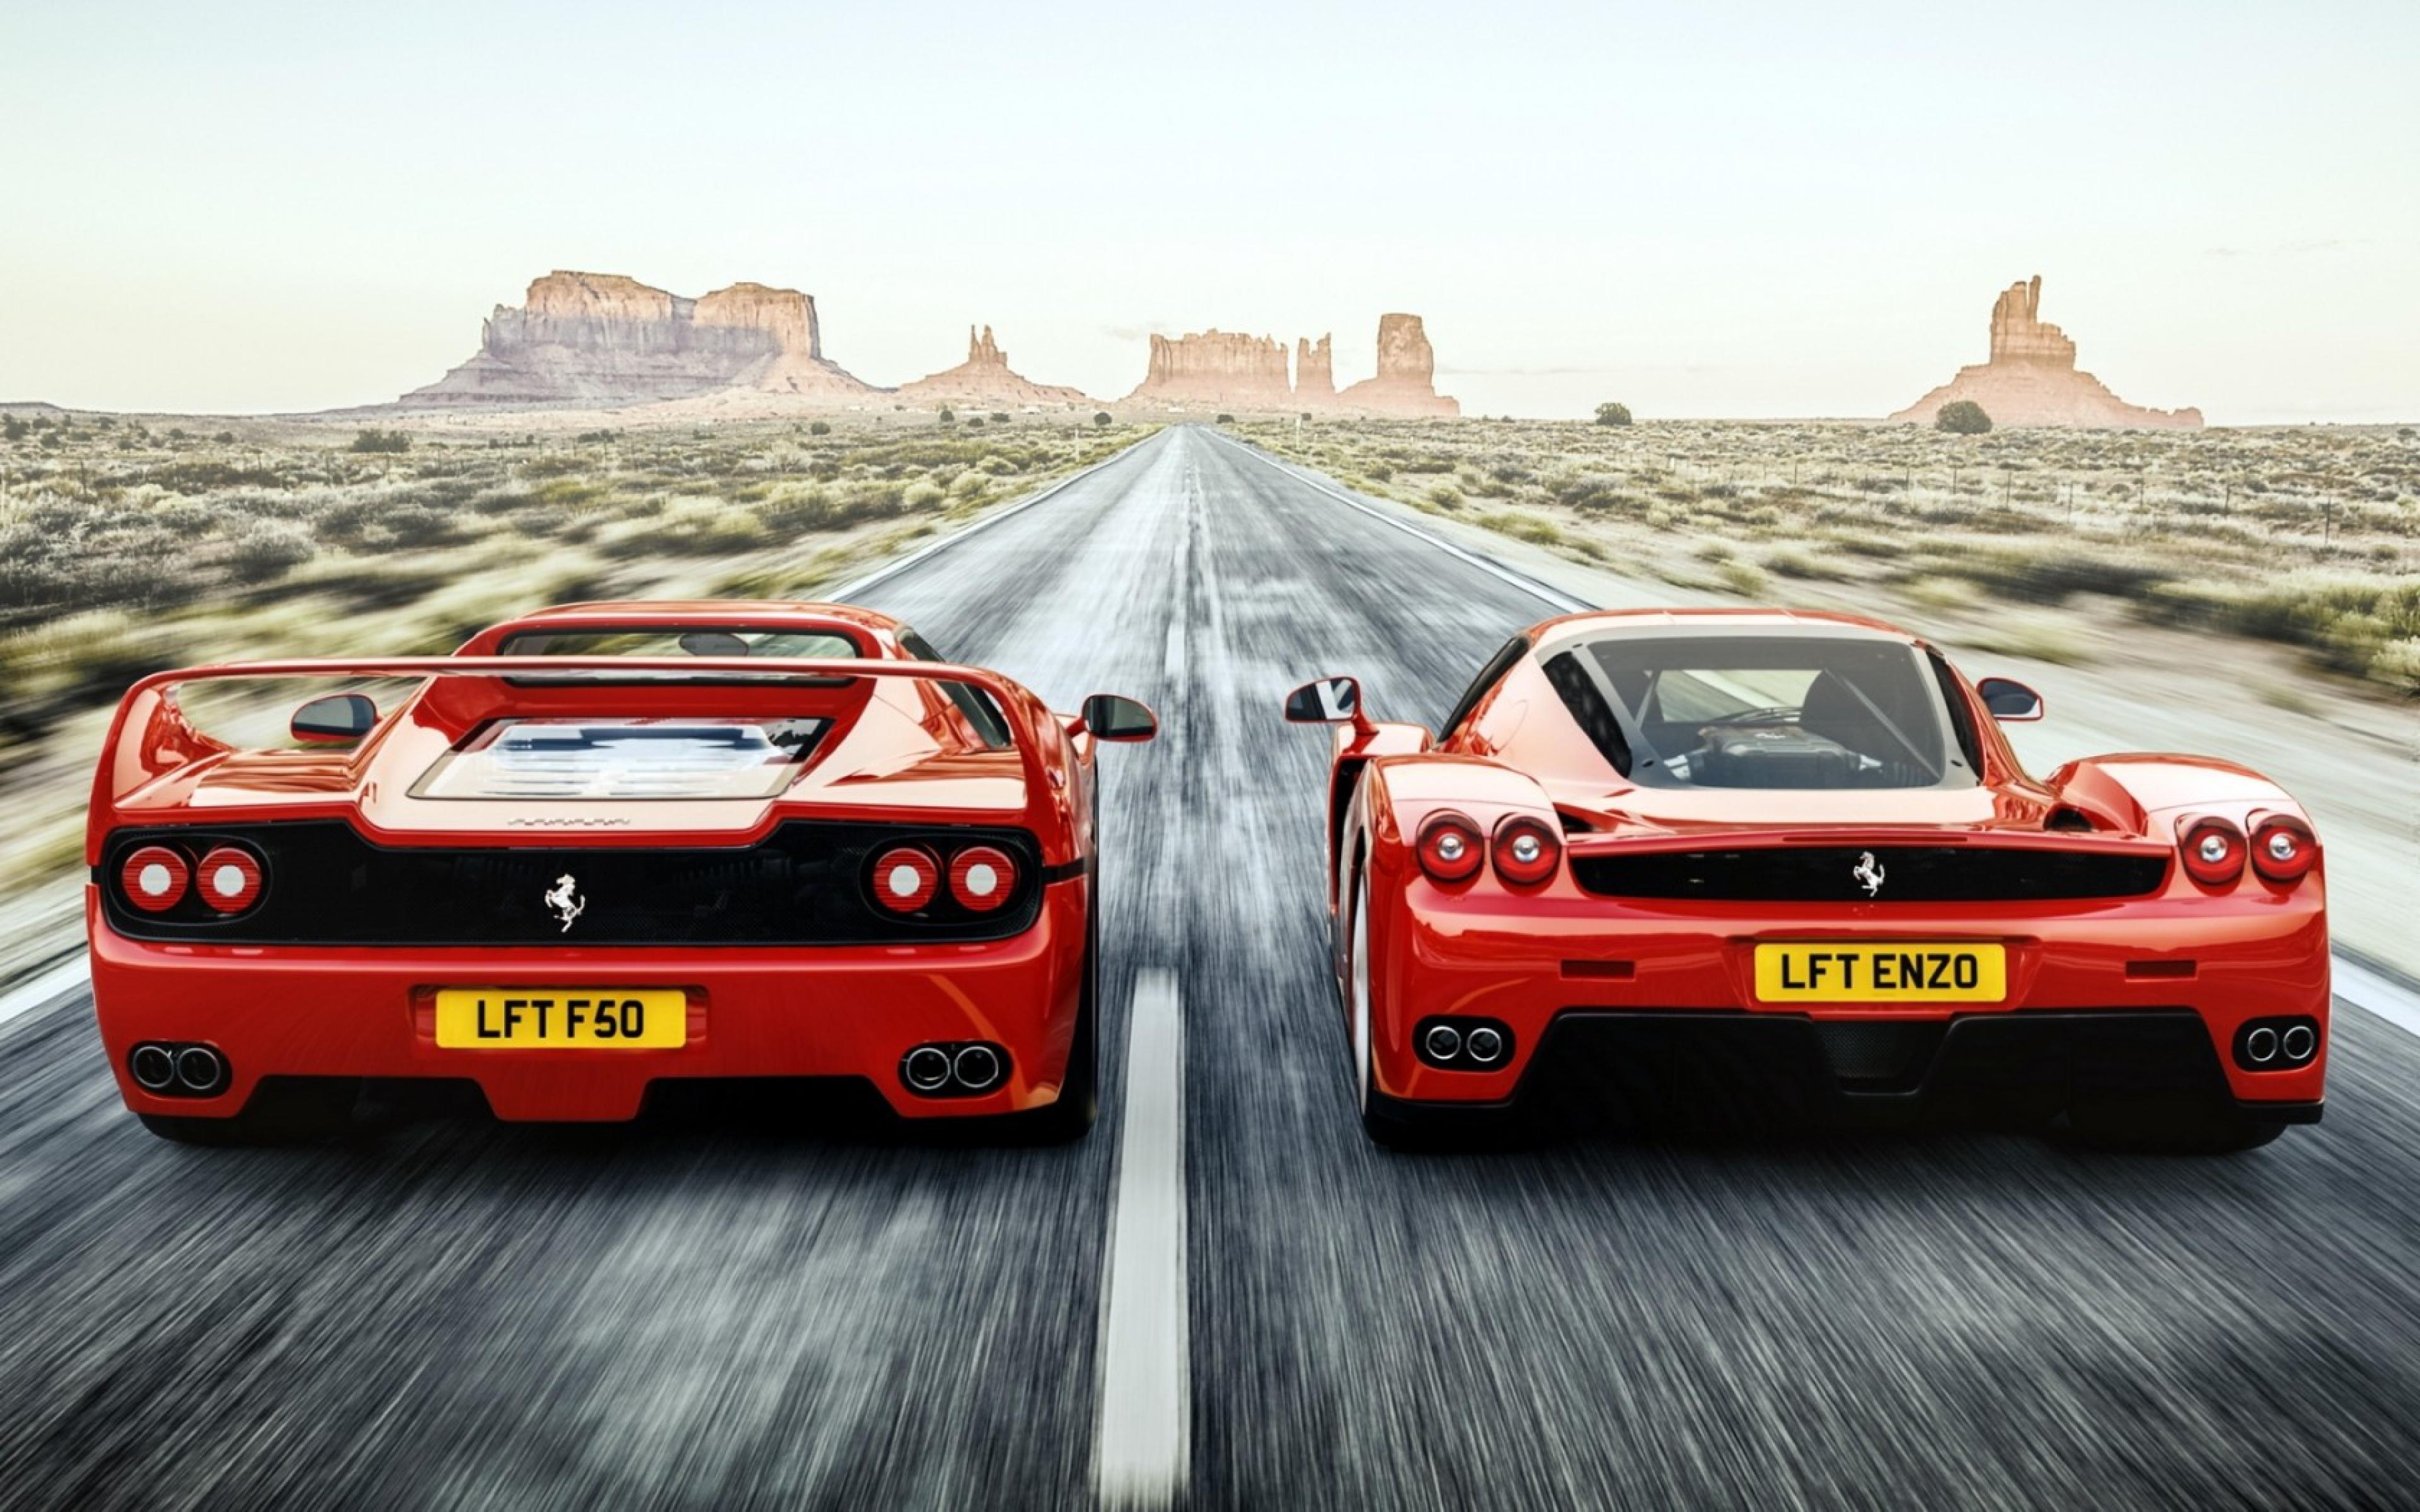 Ferrari Wallpaper For Iphone Full Hd Car Wallpapers 3840x2400 Download Hd Wallpaper Wallpapertip